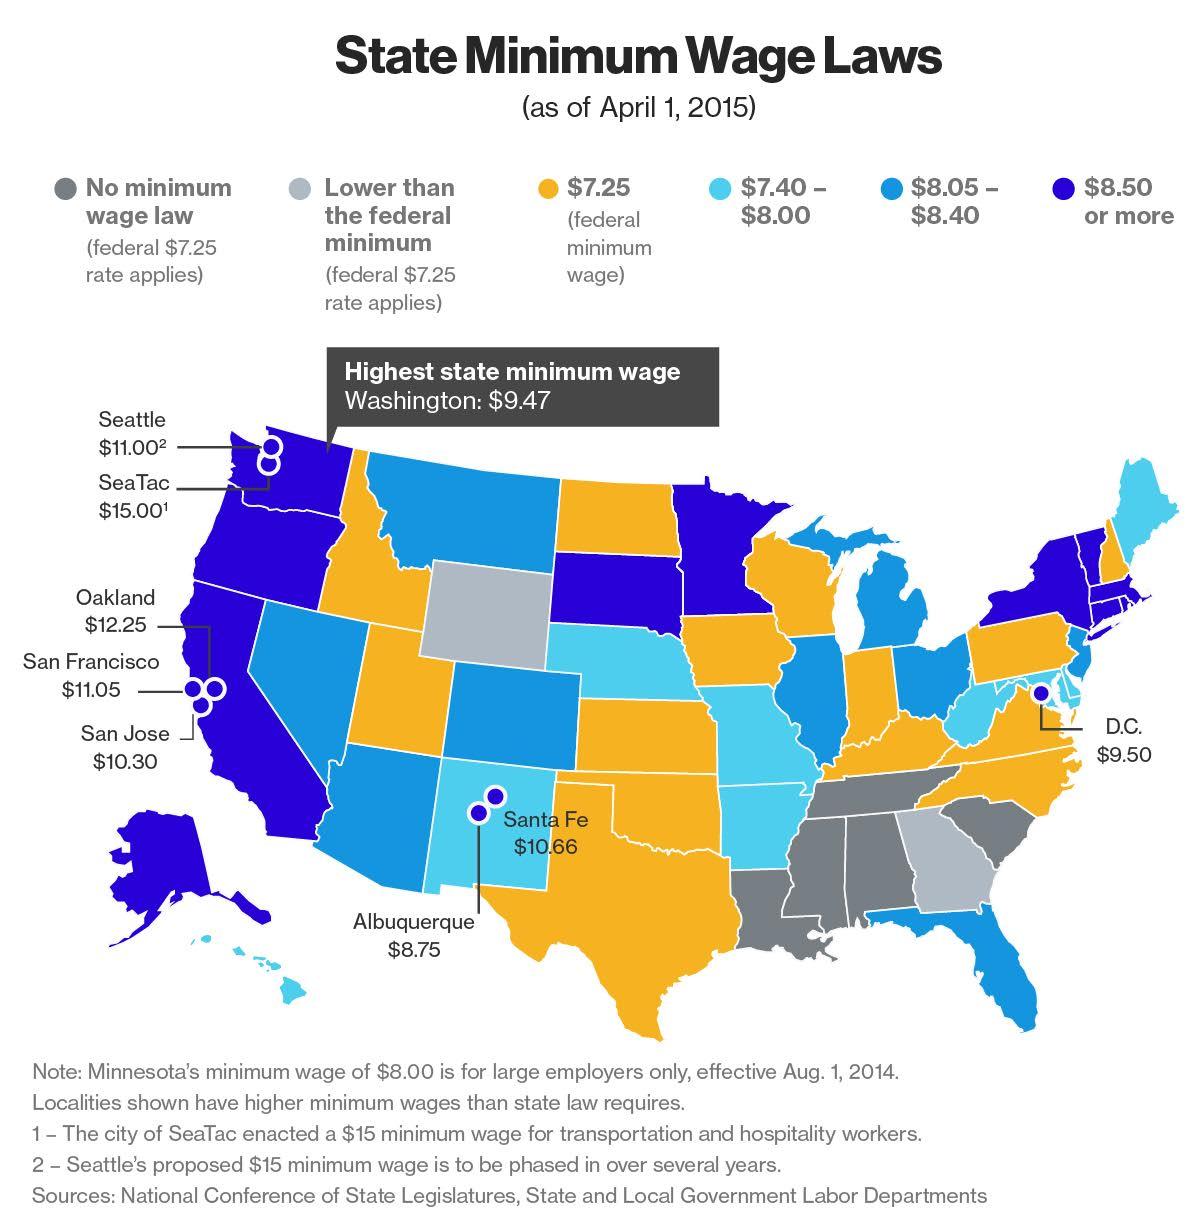 State Minimum Wage Map | Tamma Capital | Personalized Investing